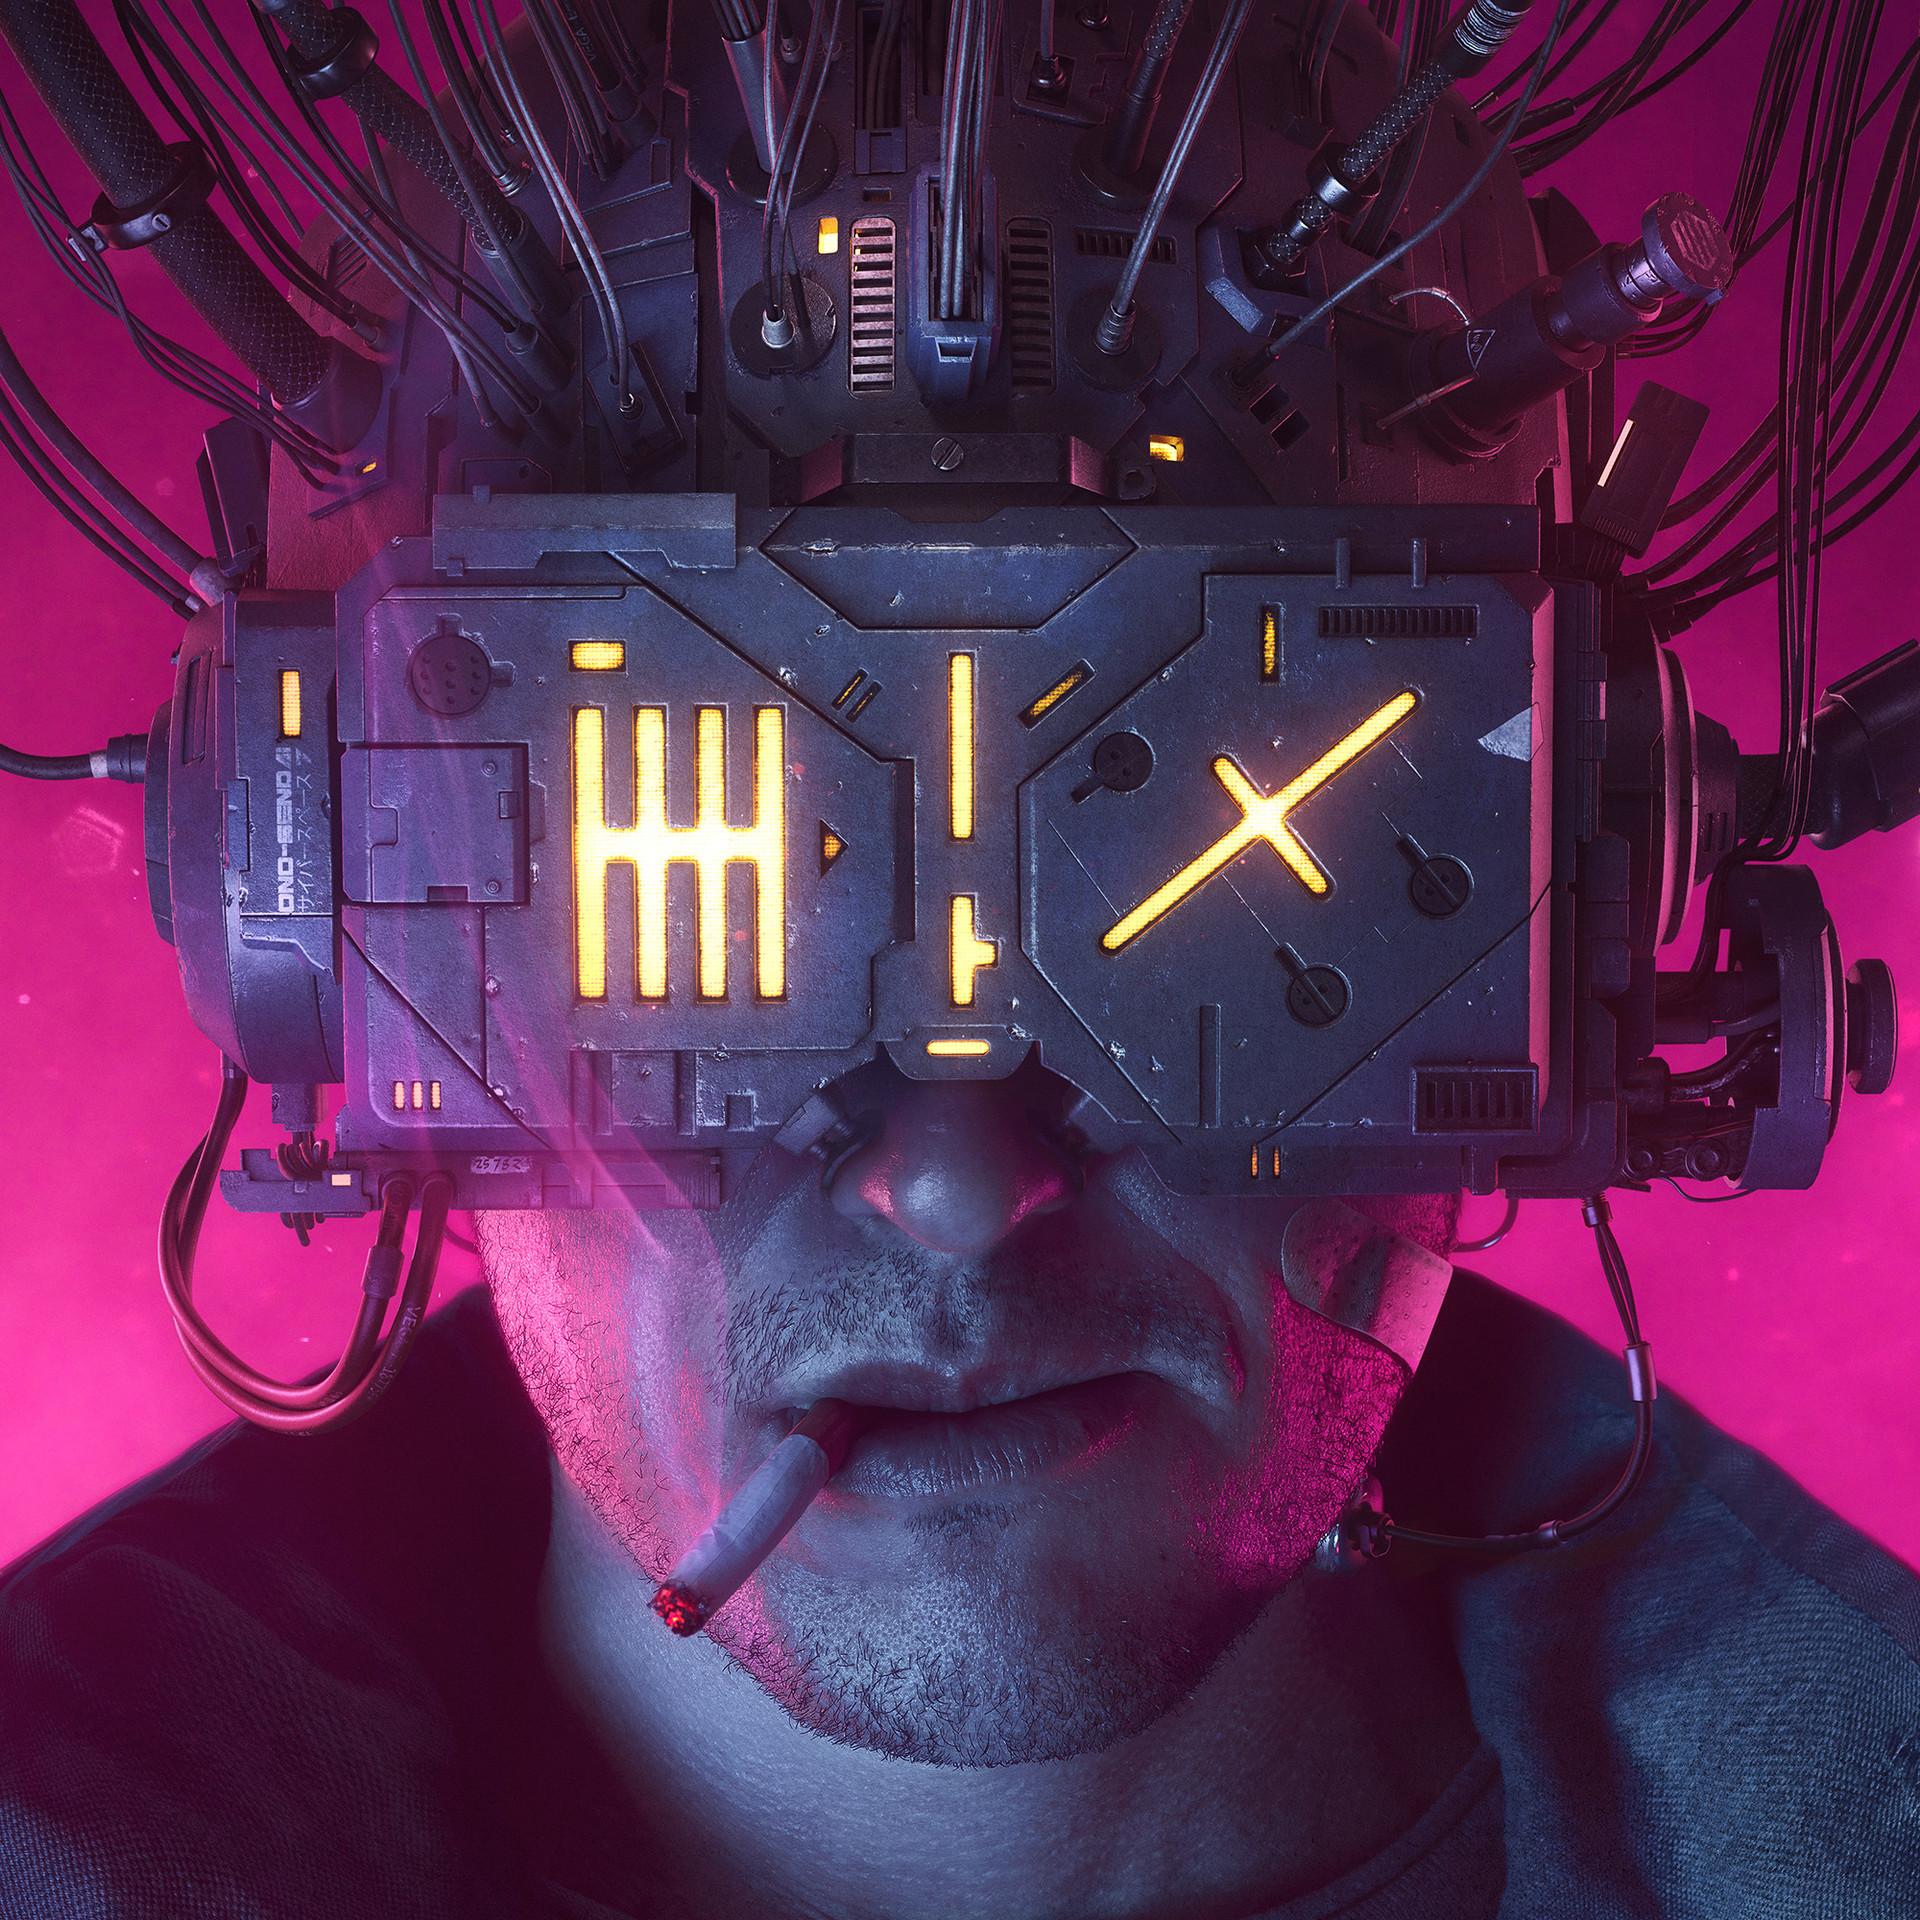 Awesome Neuromancer Artwork by Rafael Moco